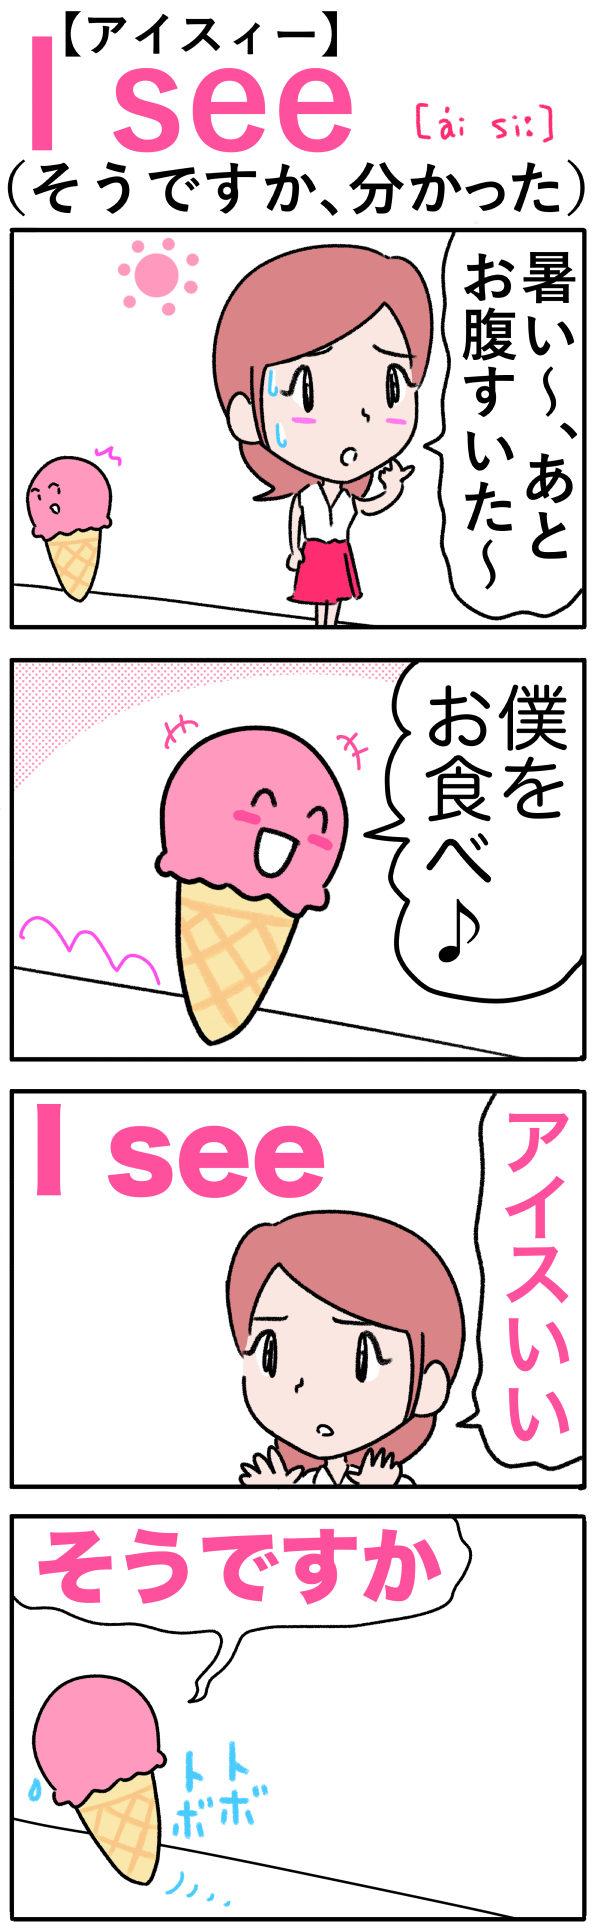 I see(そうですか)の語呂合わせ英単語